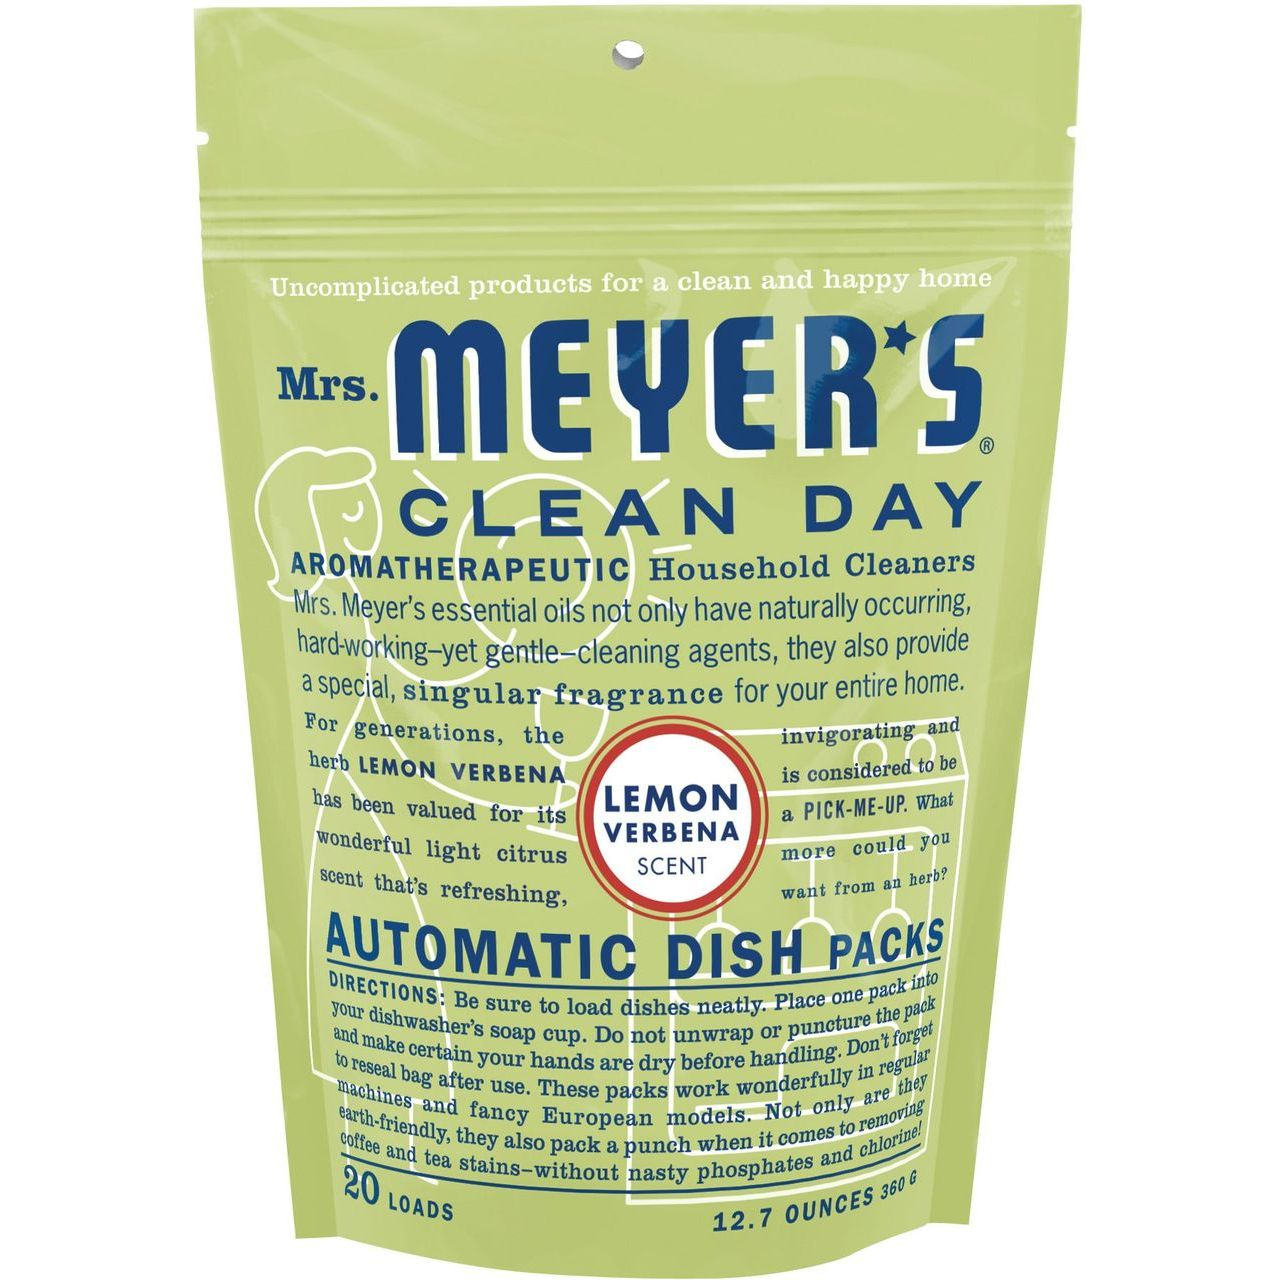 Caldrea 12.7 oz Lemon Verbena Automatic Dishwasher Packs